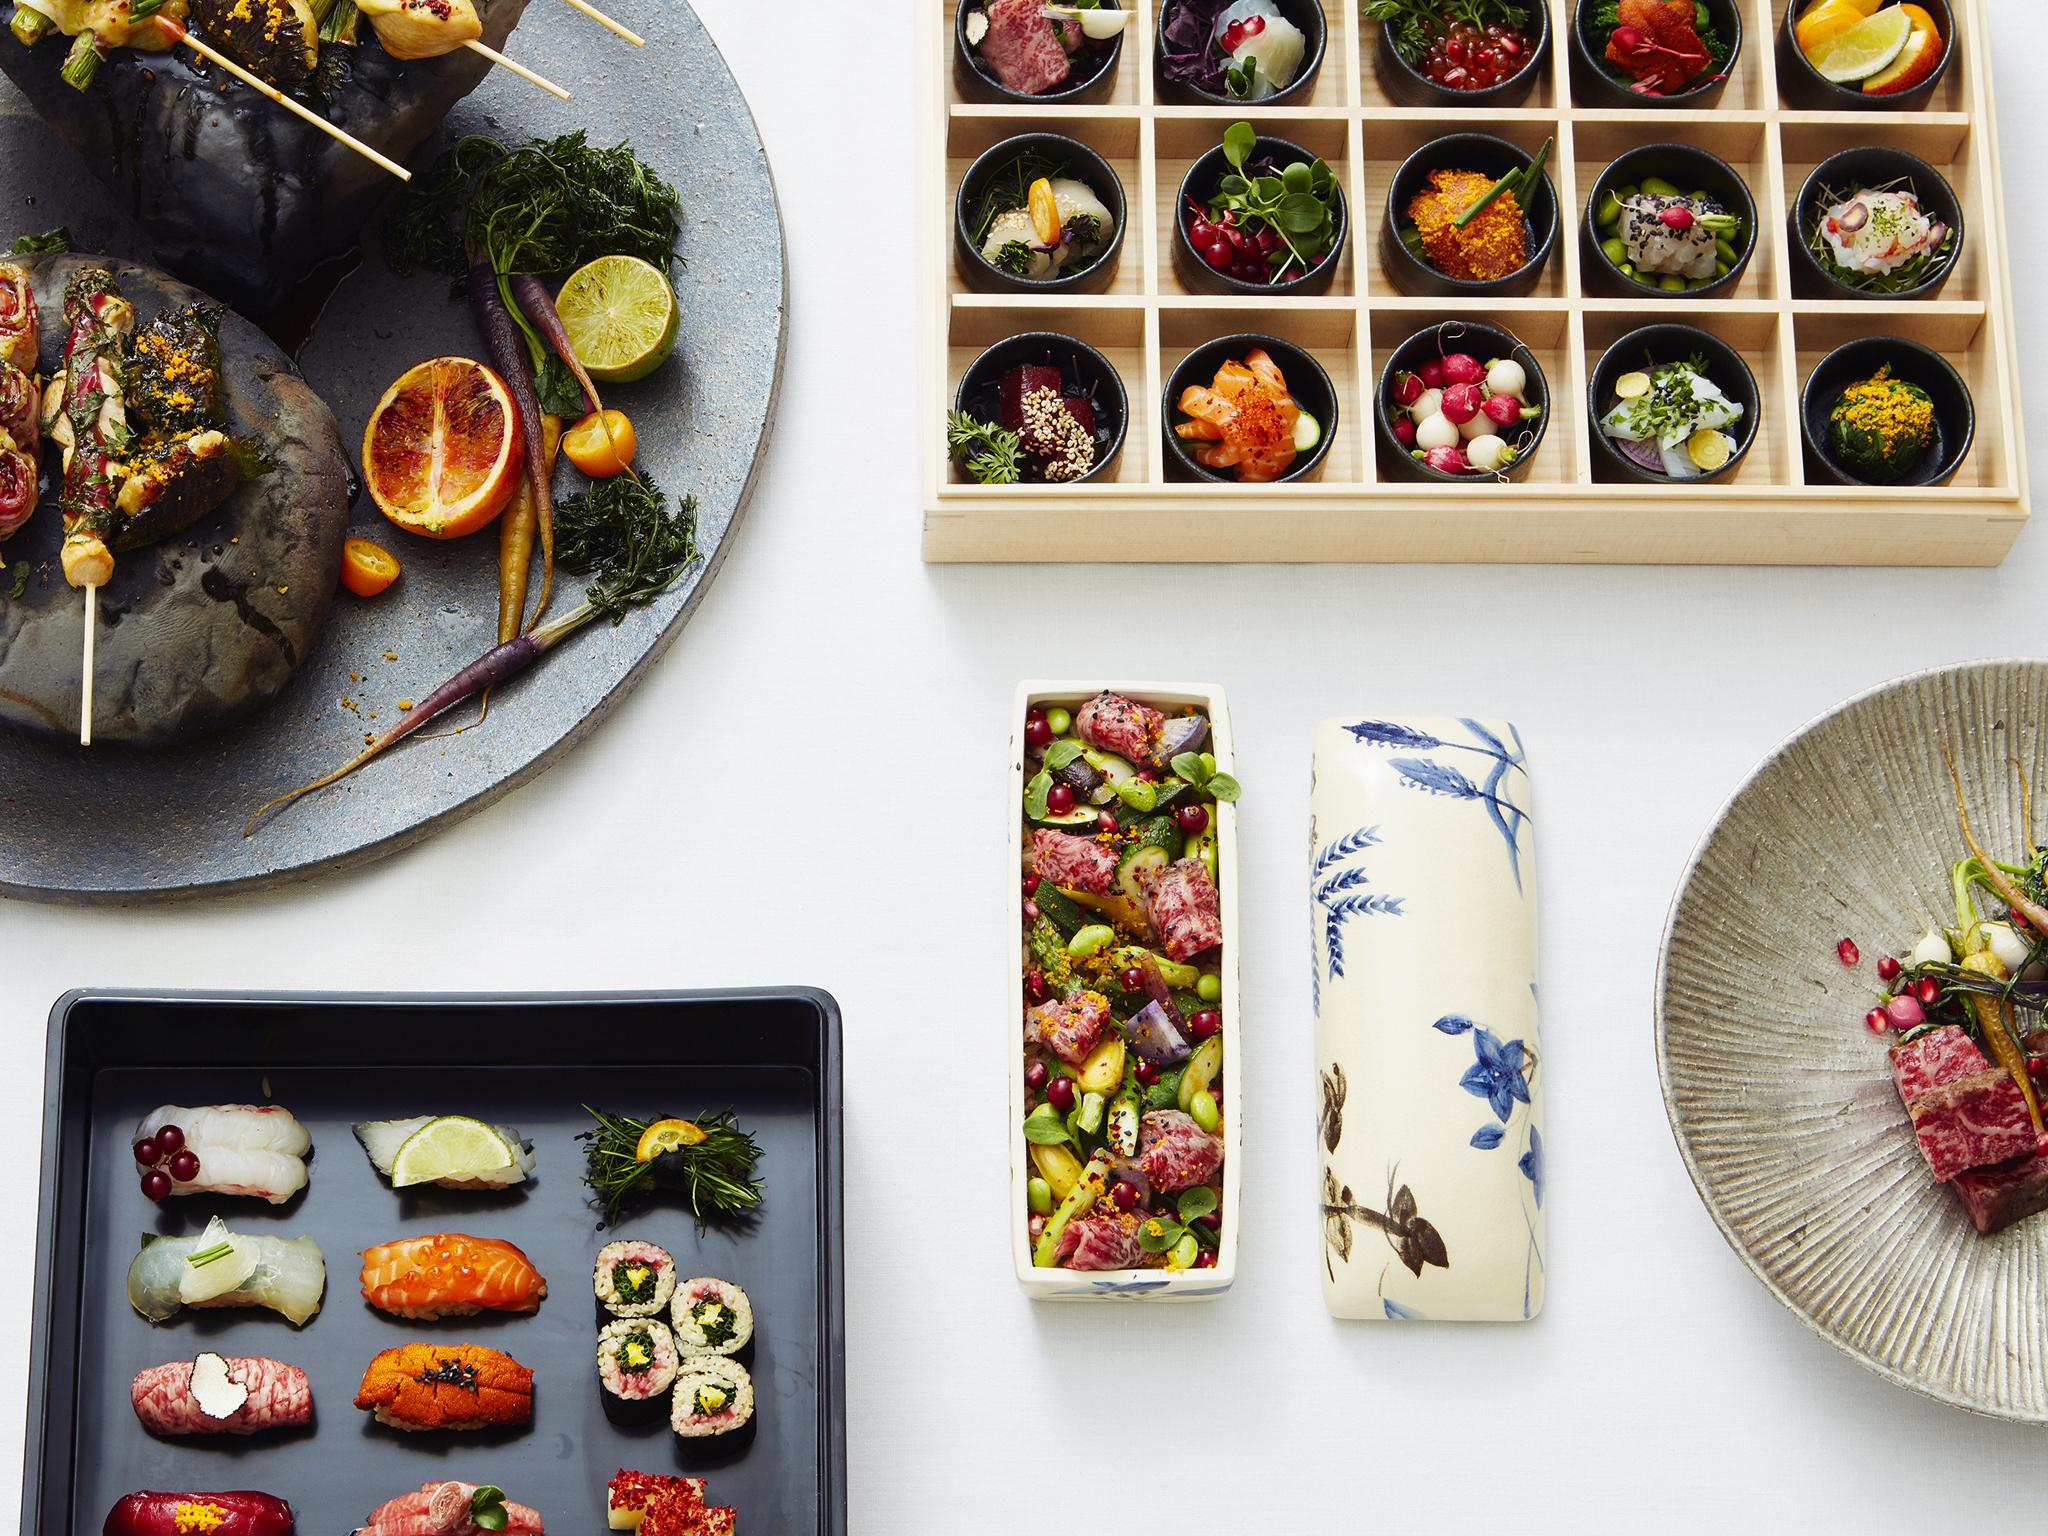 London has a new cultural hub celebrating Japanese culture